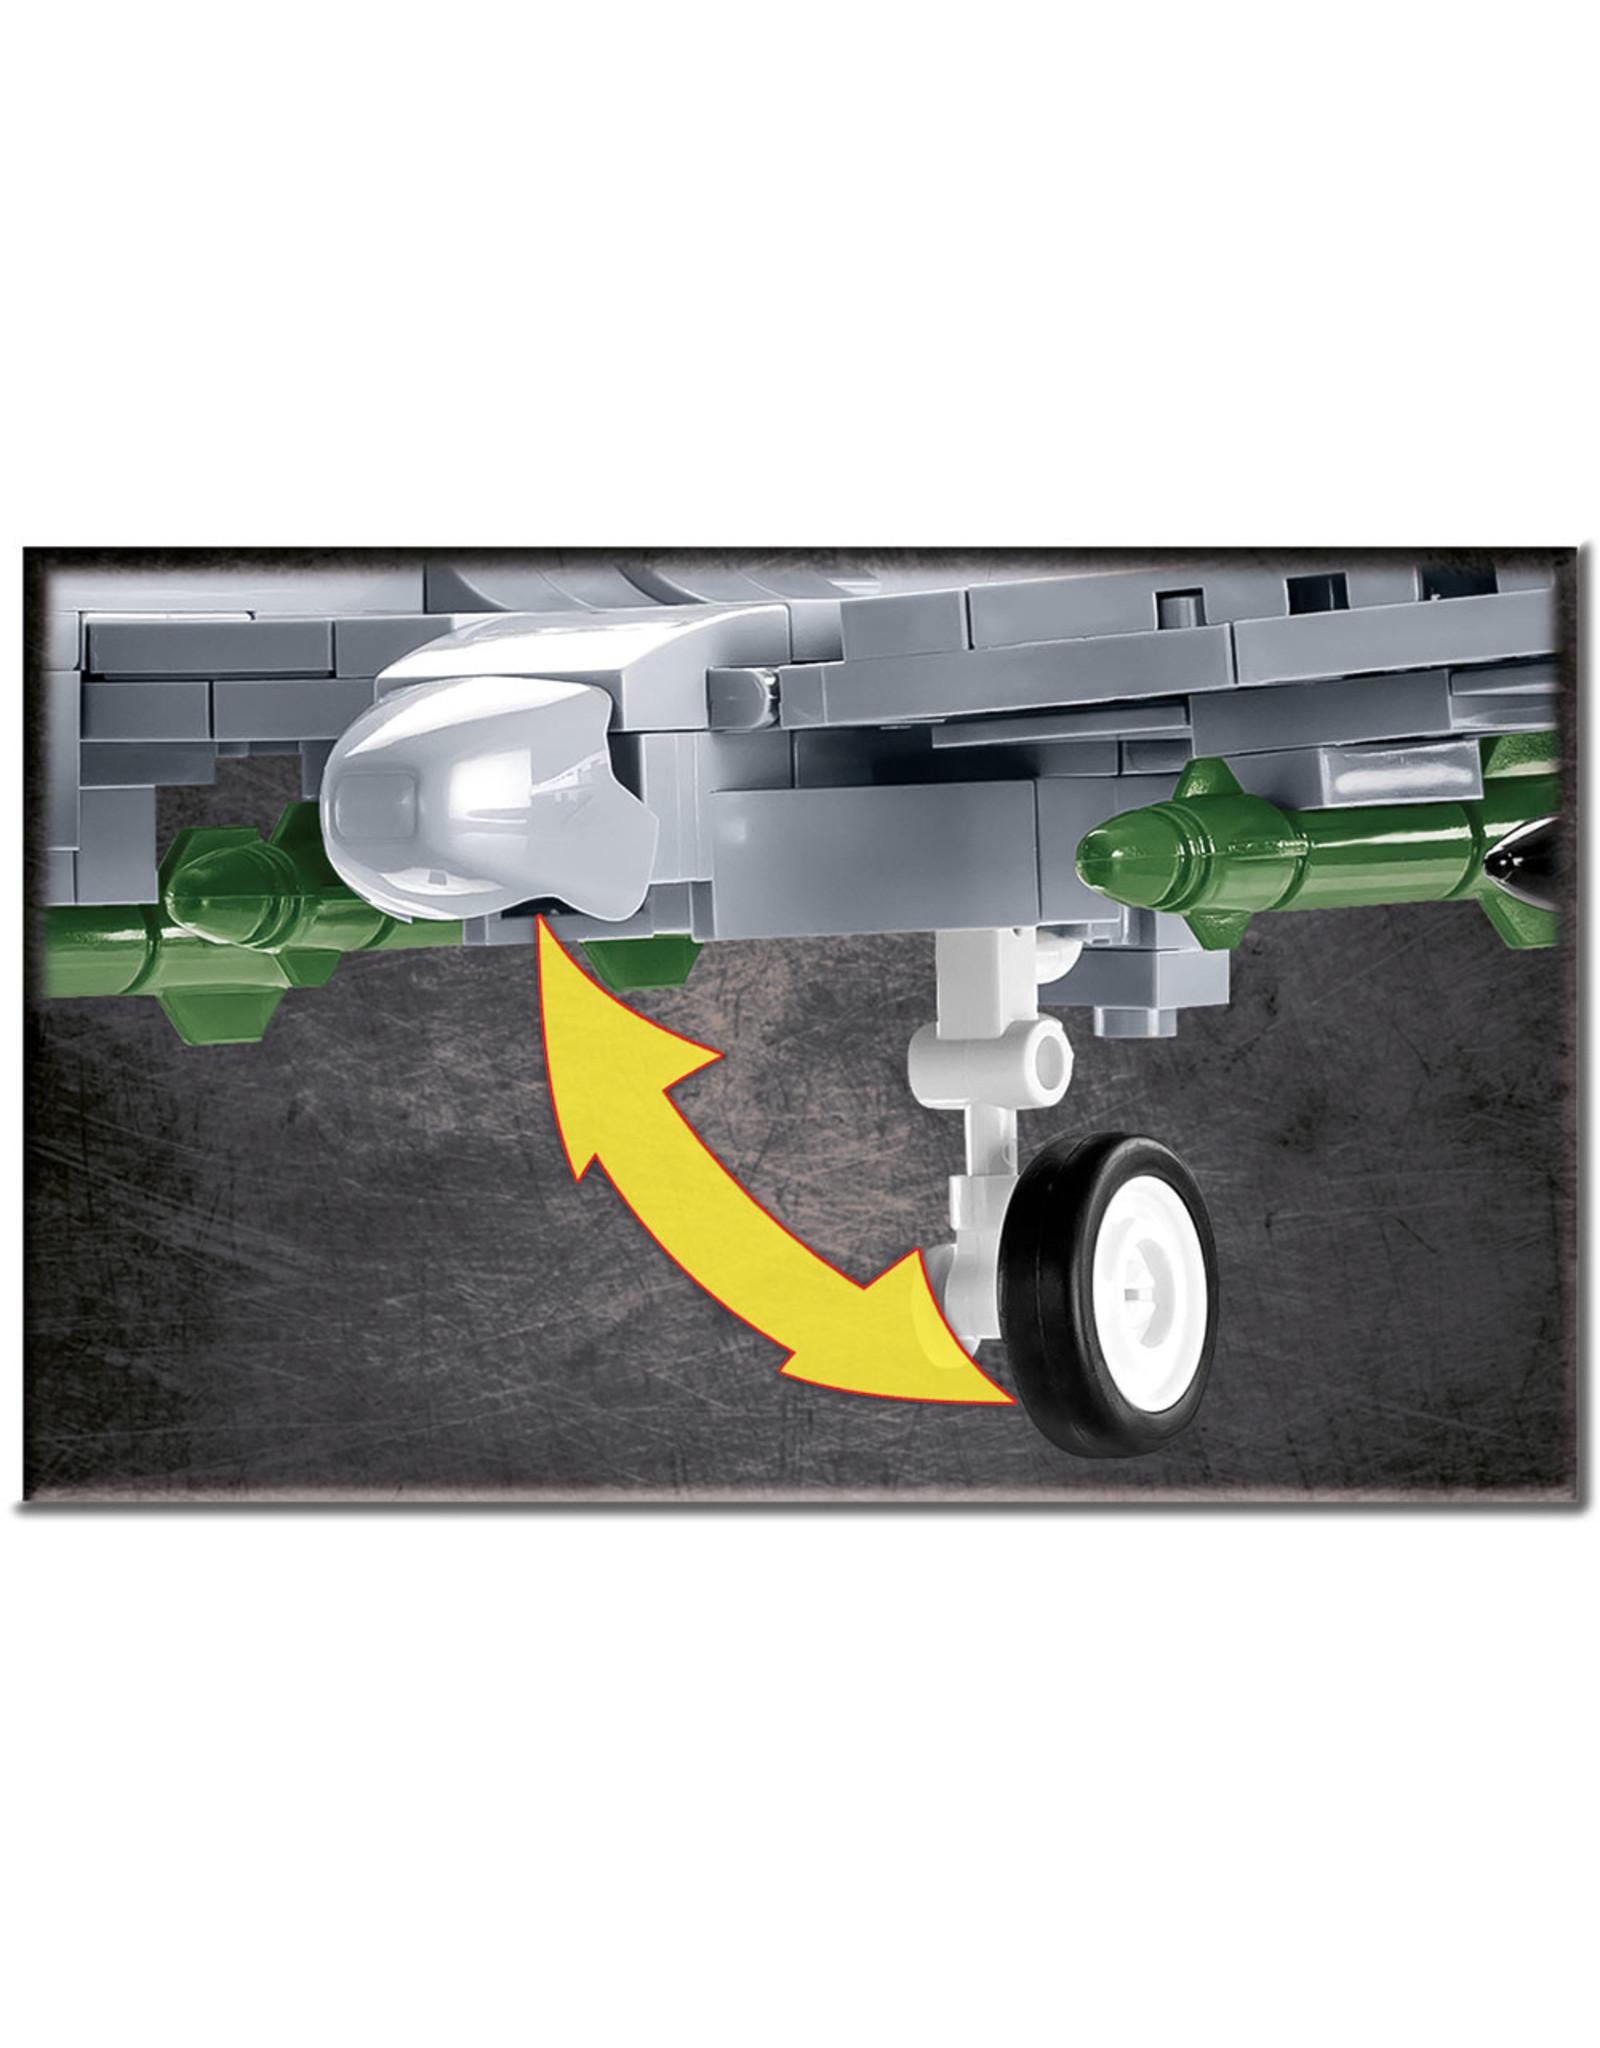 COBI COBI 5812 A10 Thunderbolt II Warthog